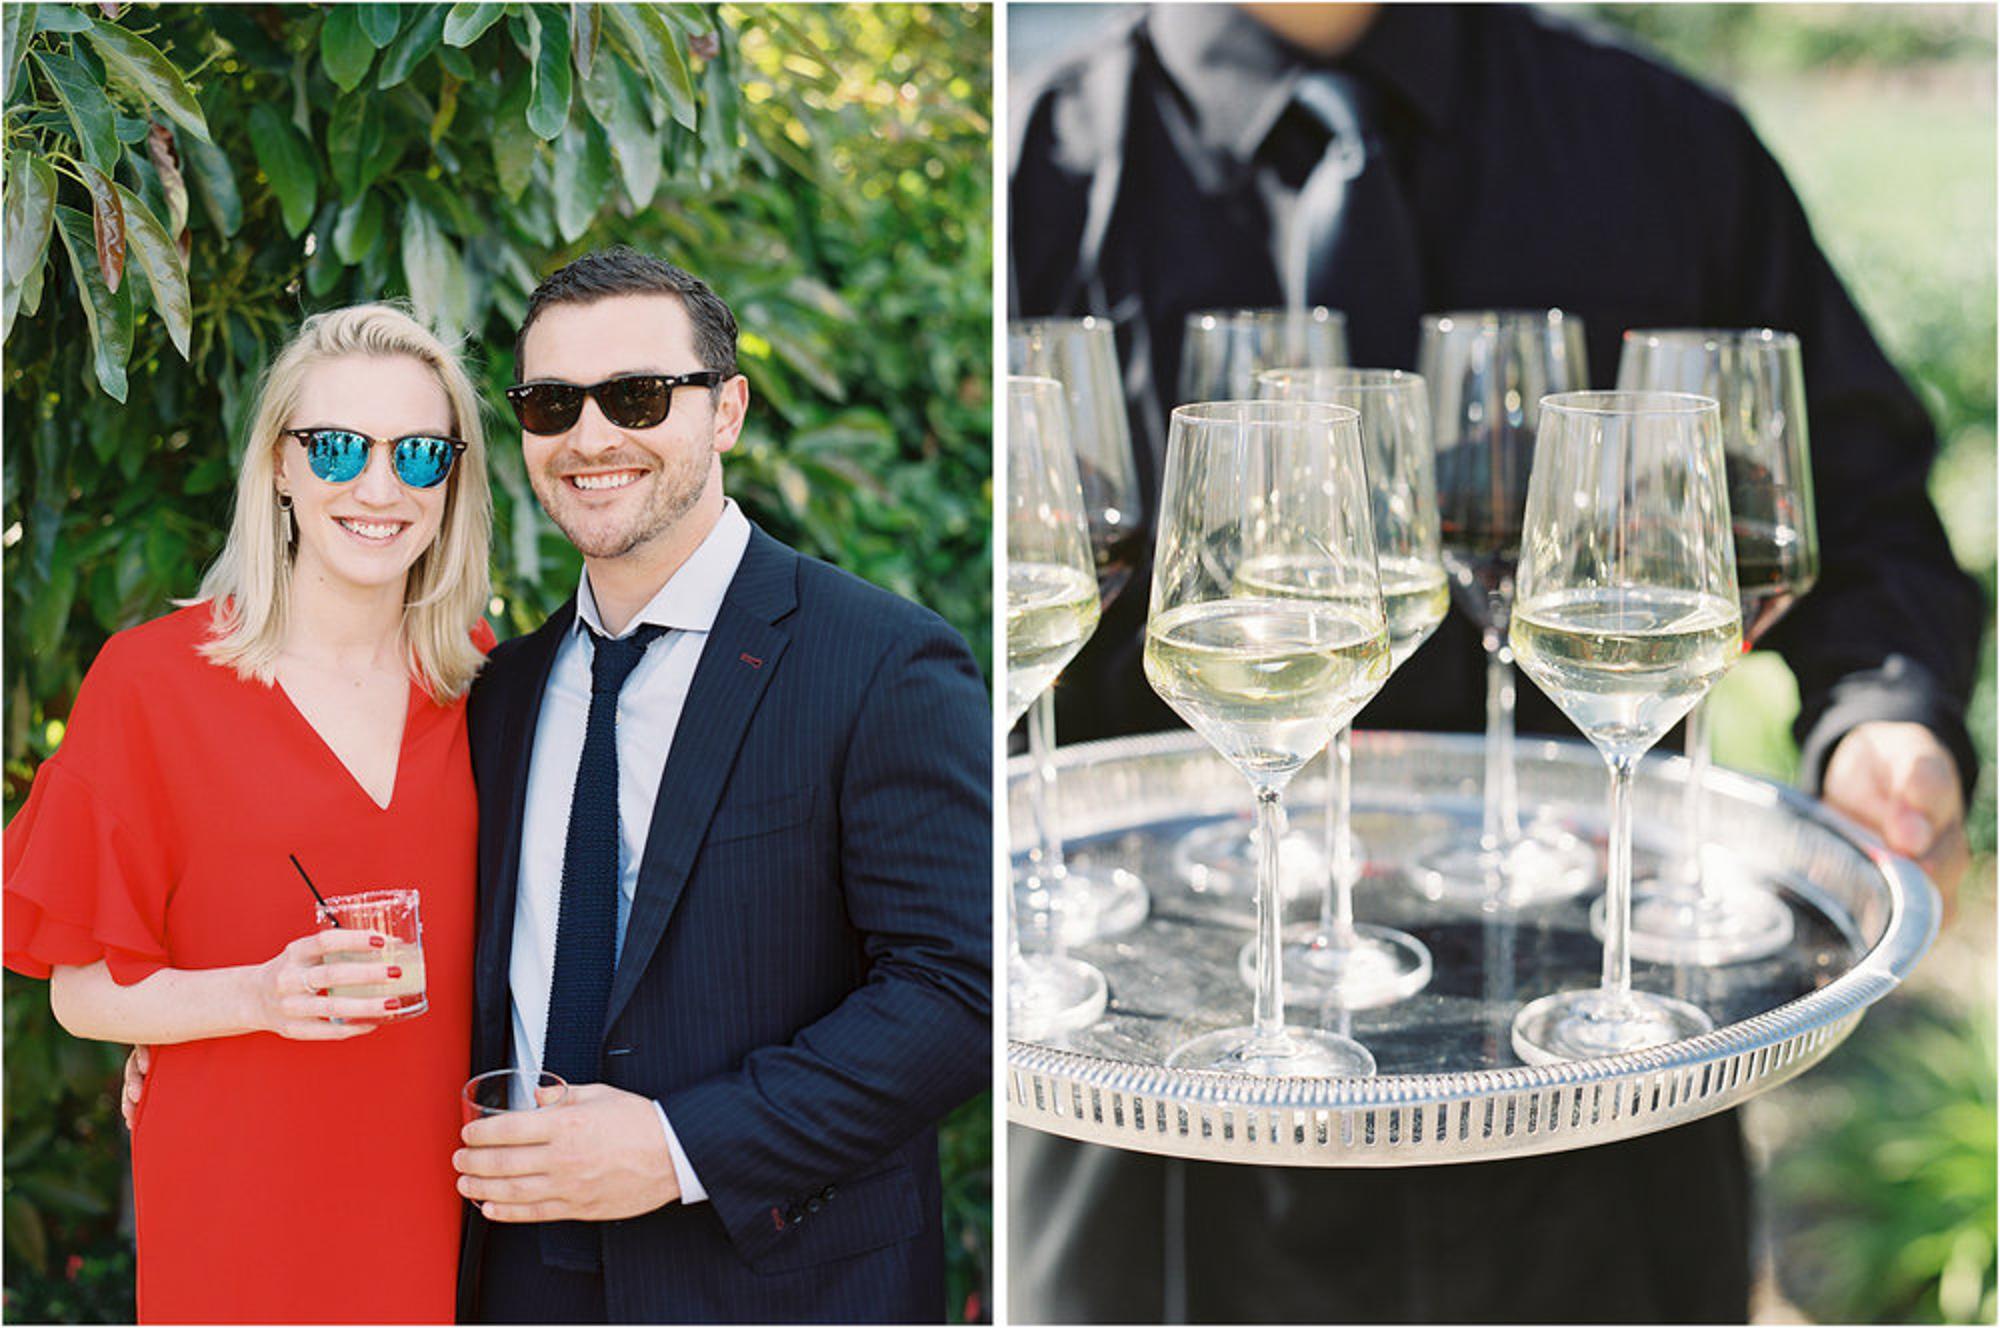 Gerry-Ranch-Wedding-Photography-Kristina-Adams-18.jpg